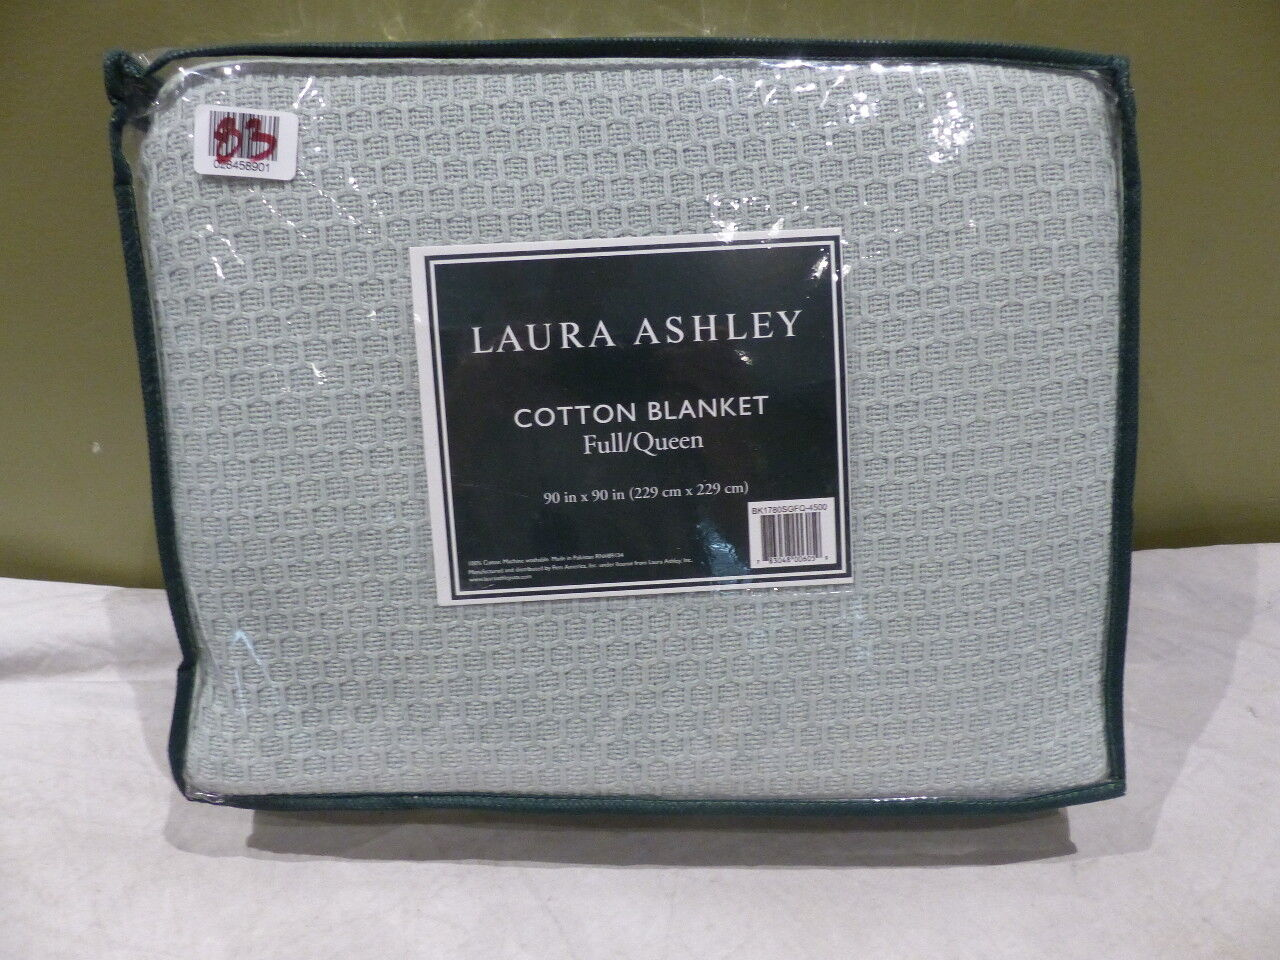 LAURA ASHLEY COTTON BLANKET QUEEN BK1780SGFQ-4500 100% COTTON